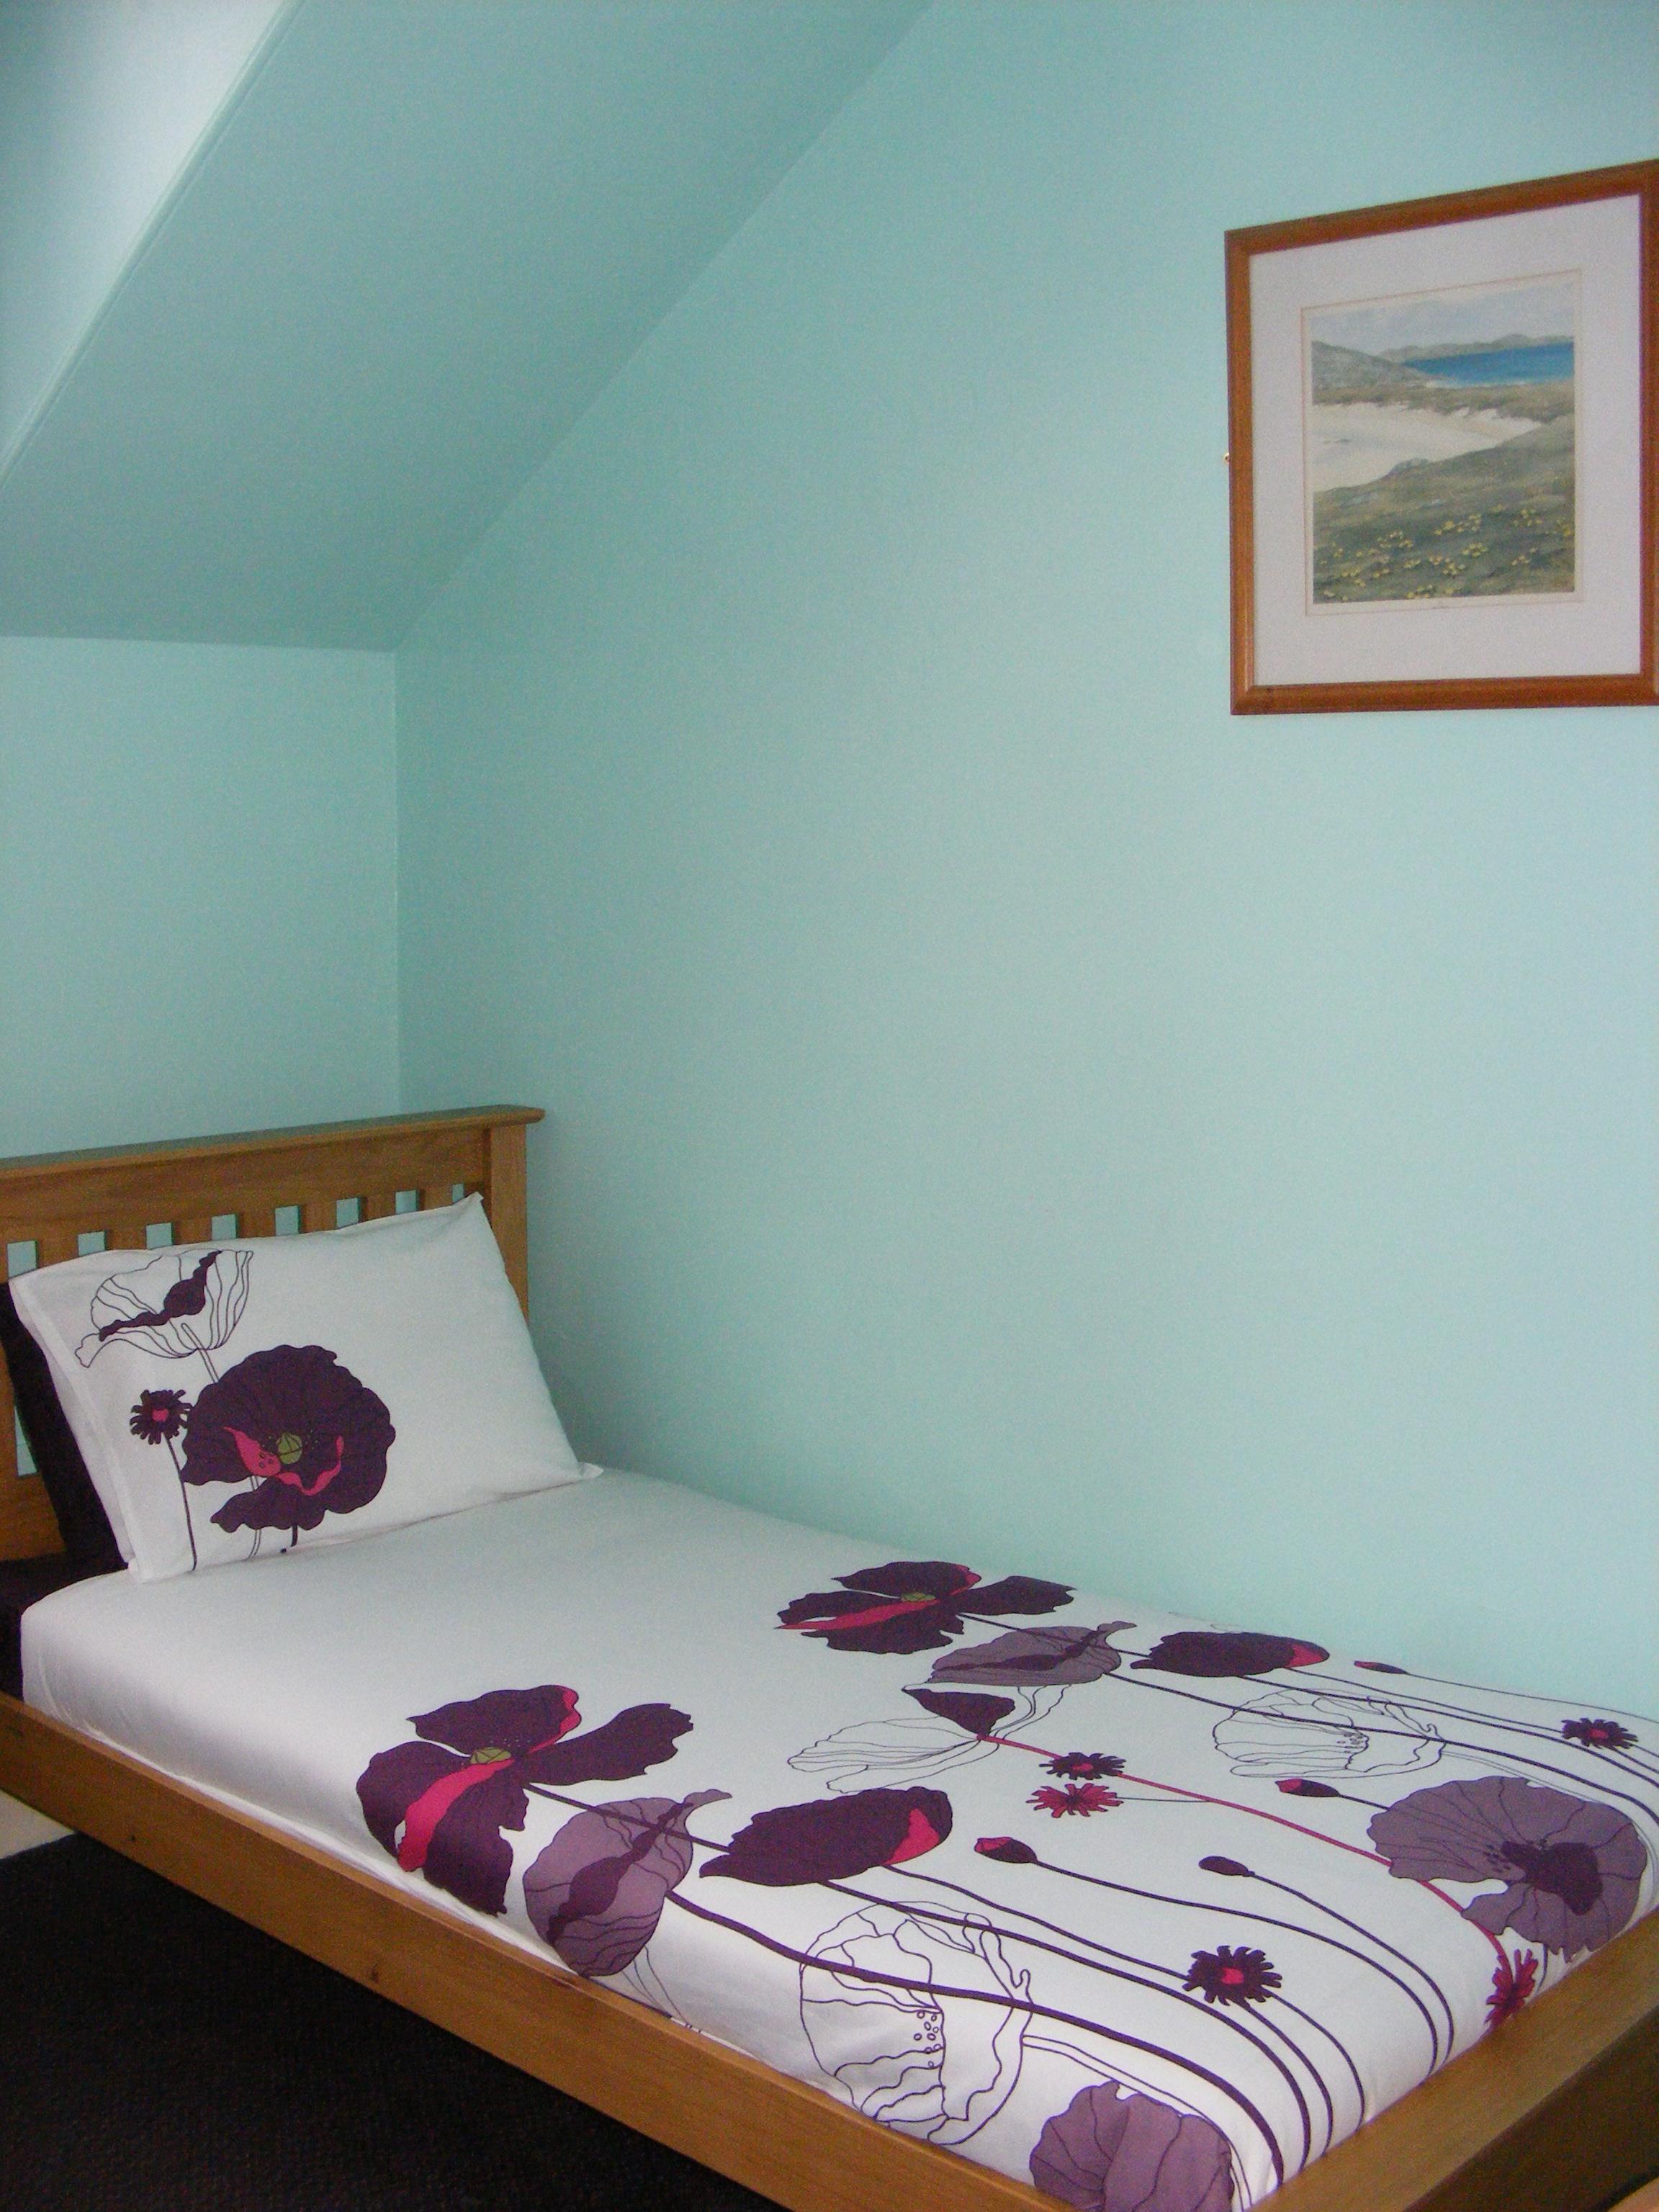 Aberdeen Youth Hostel